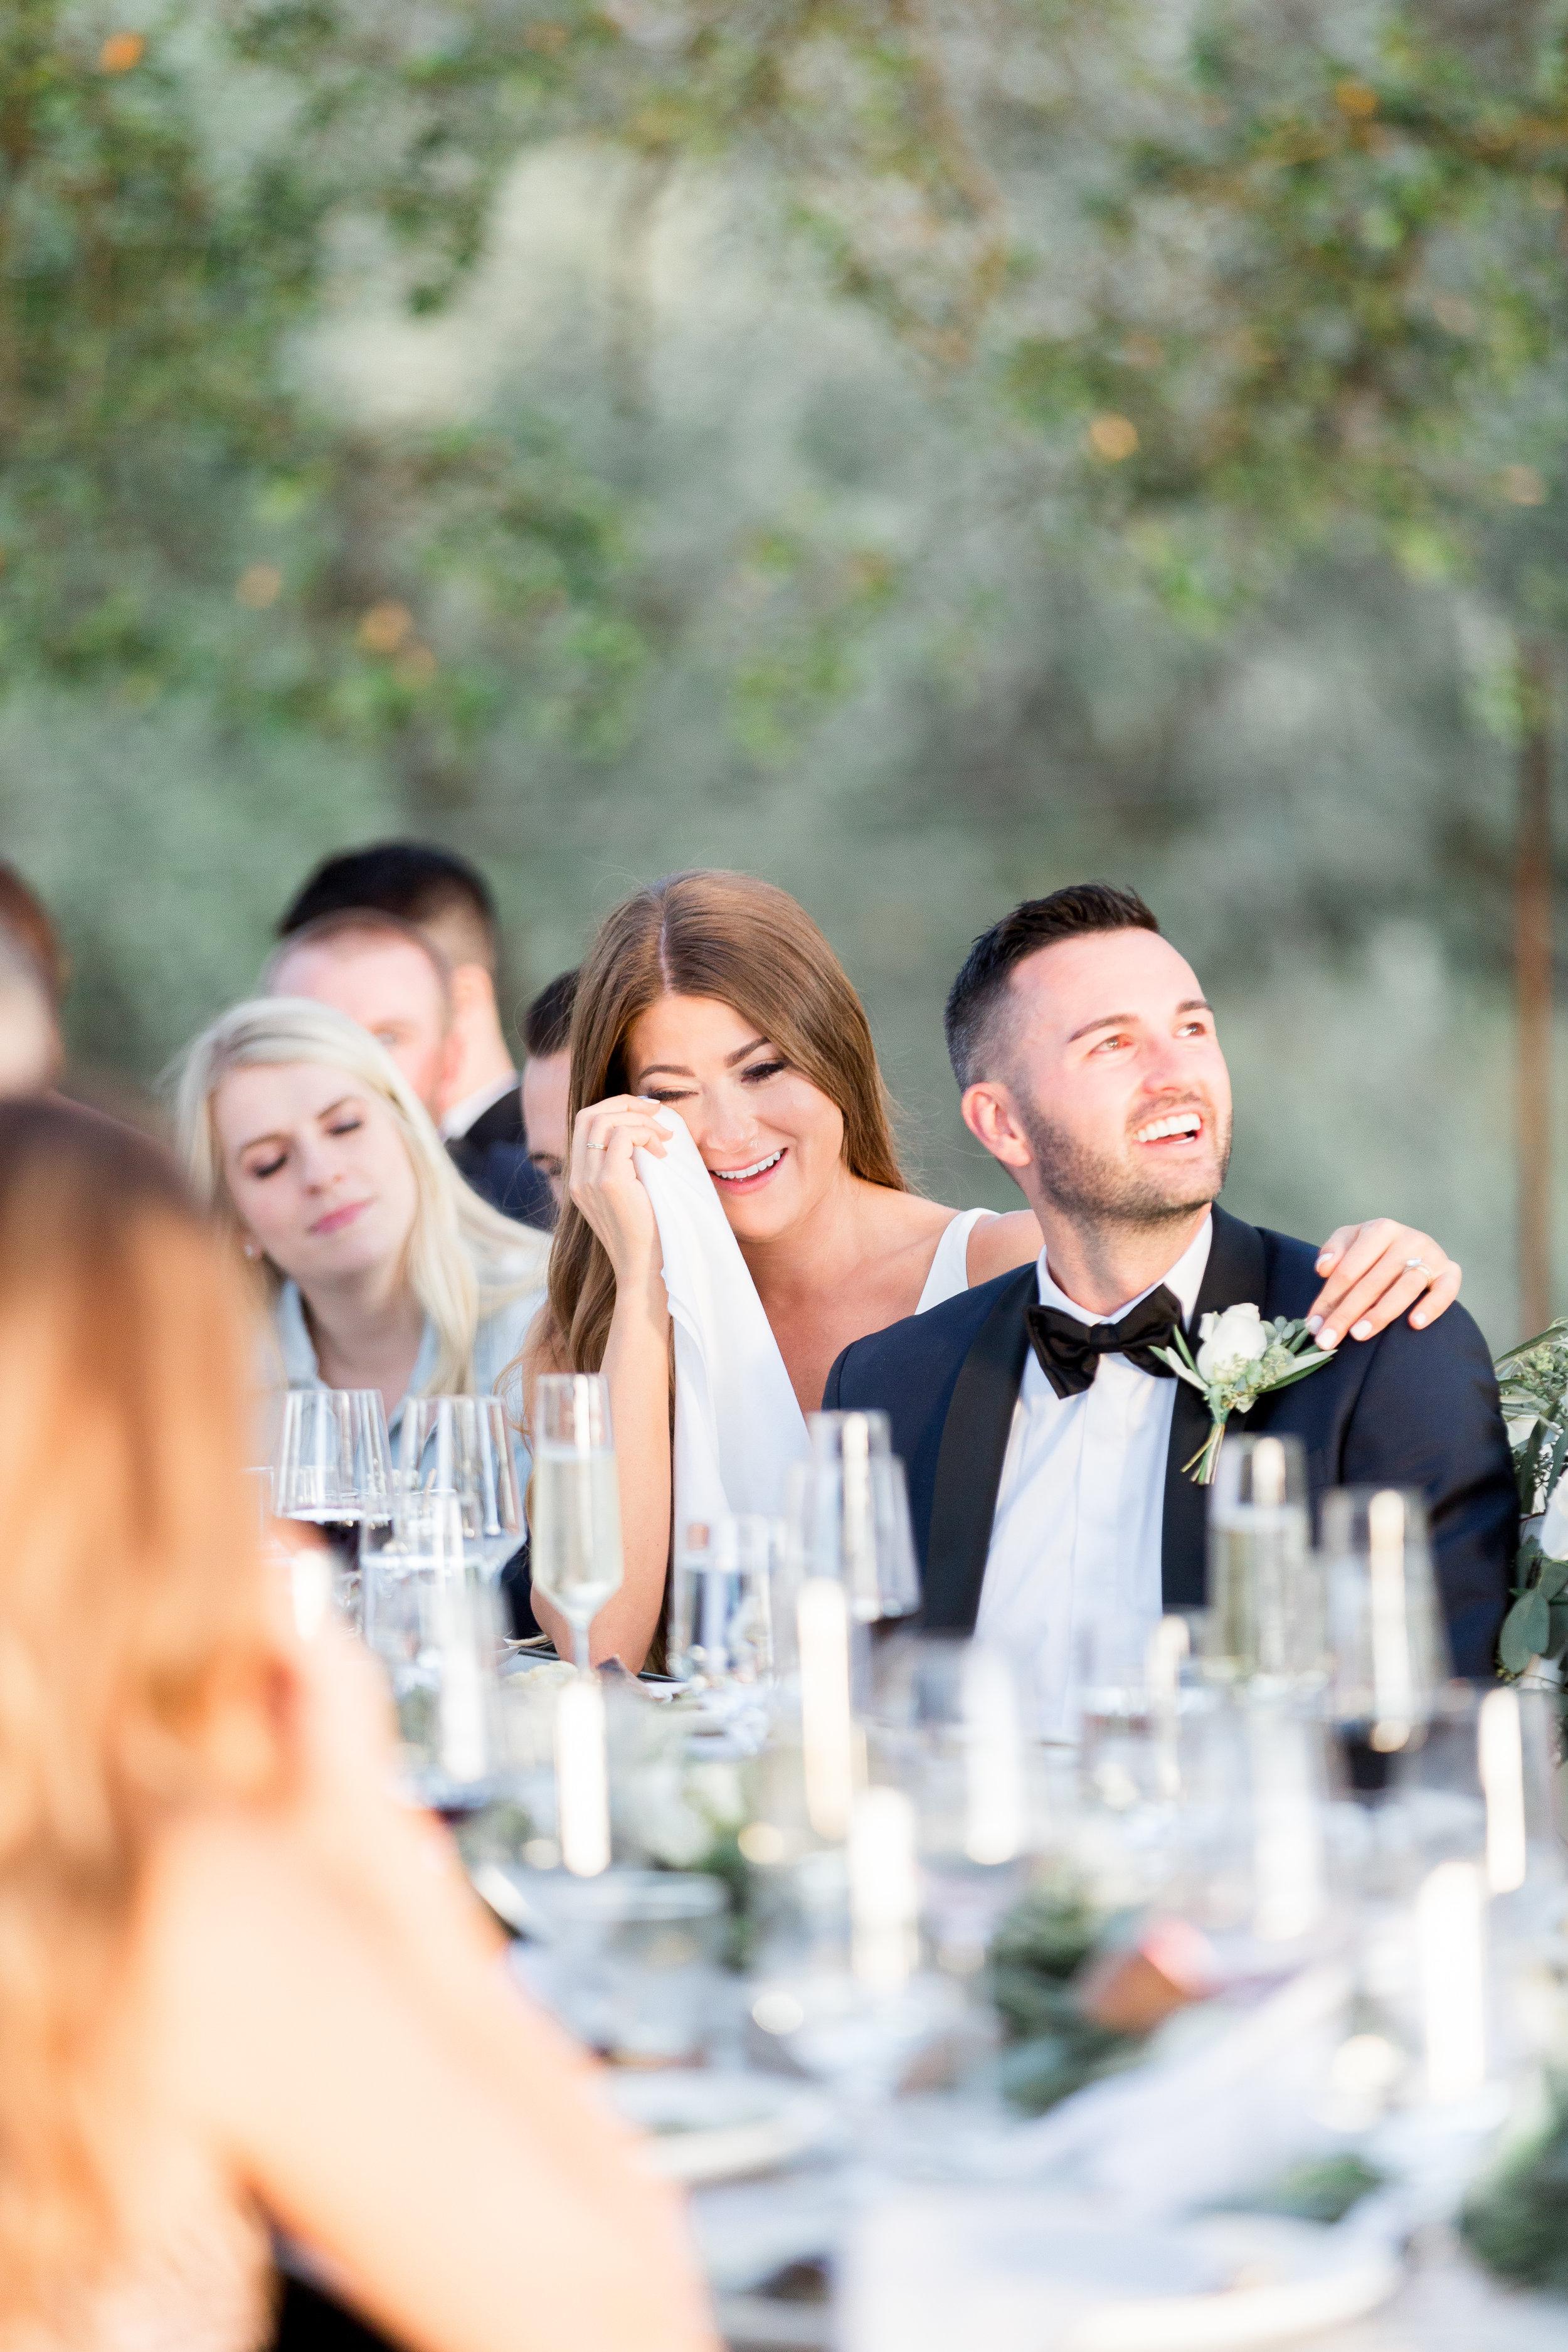 Calegari-Vineyards-Healdsburg-Wedding-Photographer (215 of 262).jpg